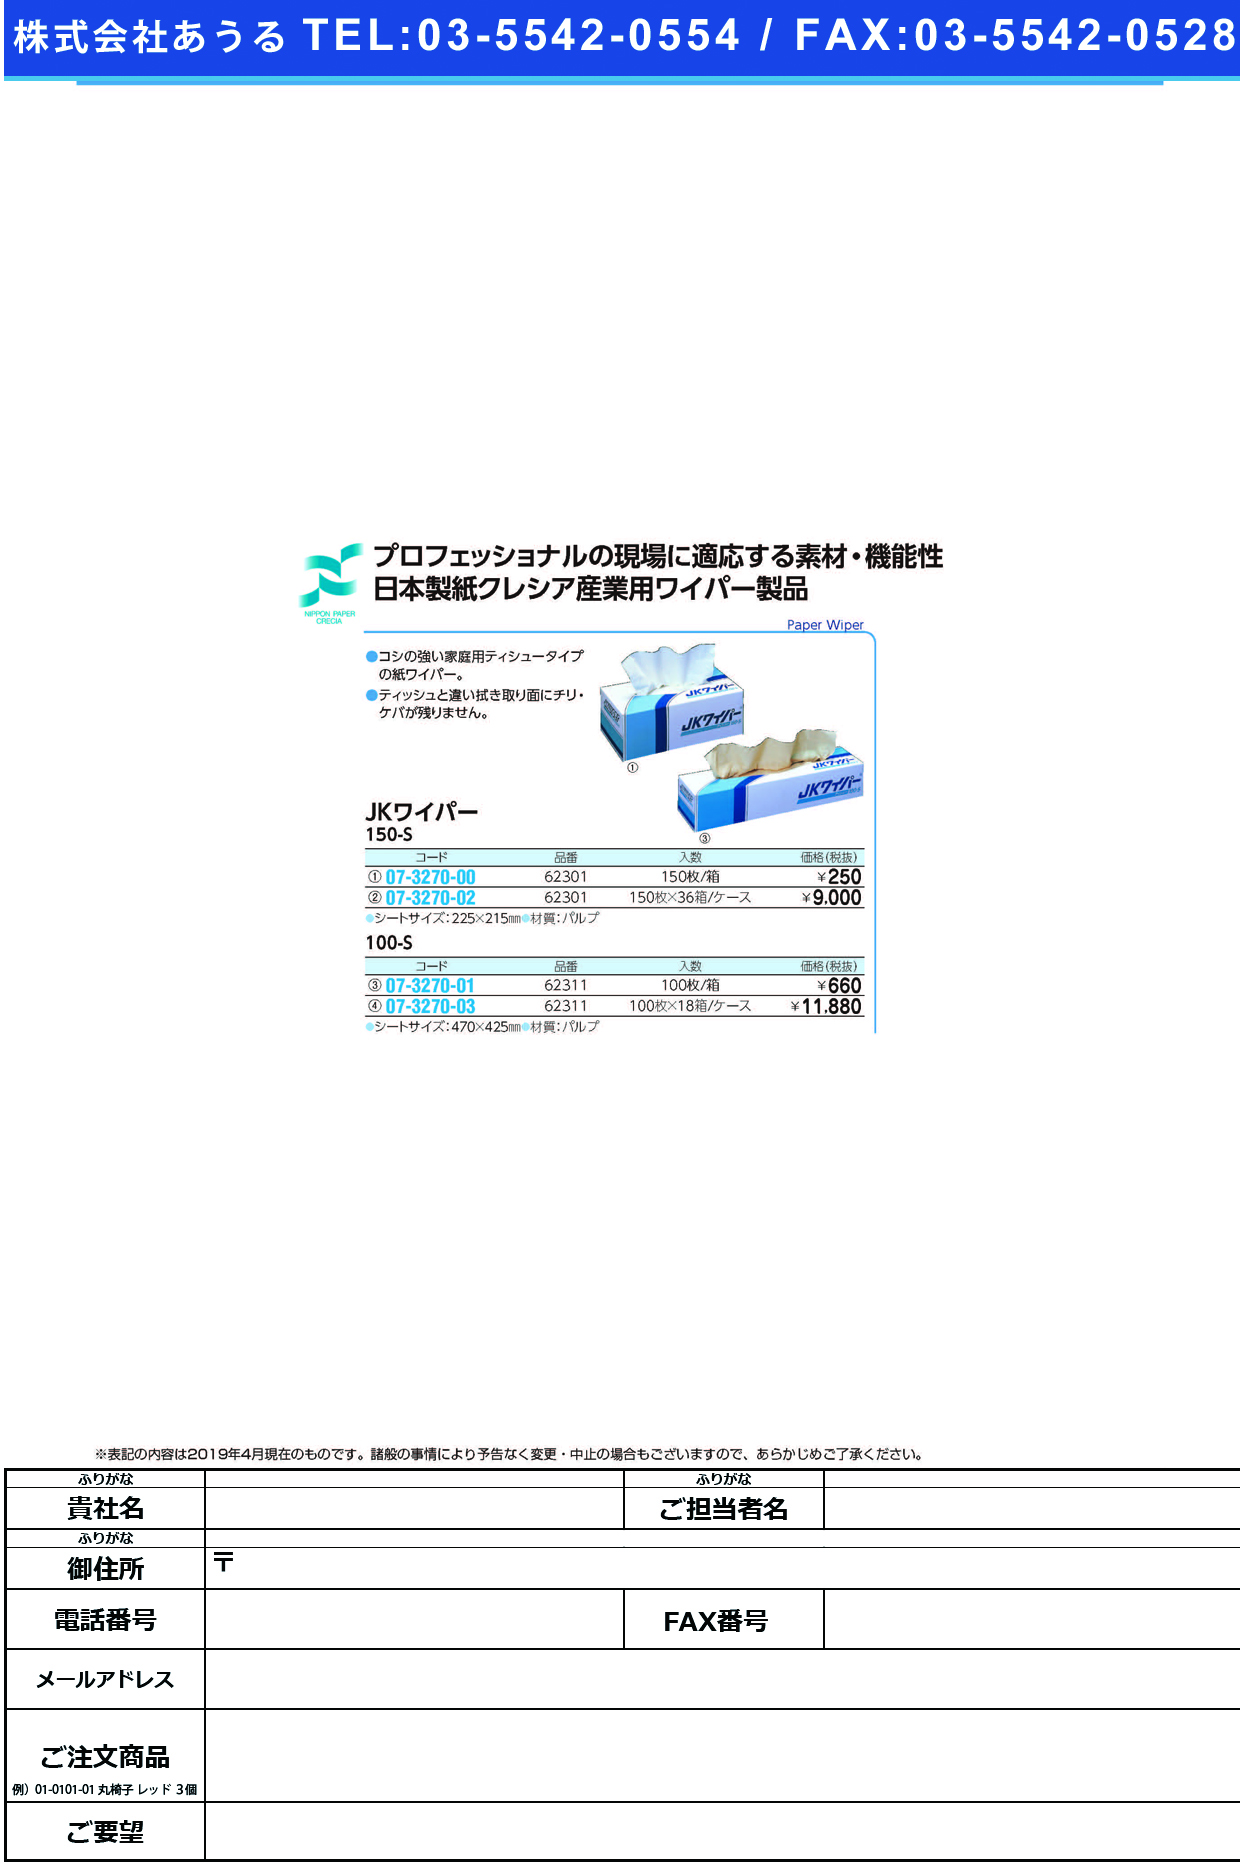 (07-3270-00)JKワイパー150−S(バラ) 62301(150マイ) JKワイパー150-S(日本製紙クレシア)【1箱単位】【2019年カタログ商品】